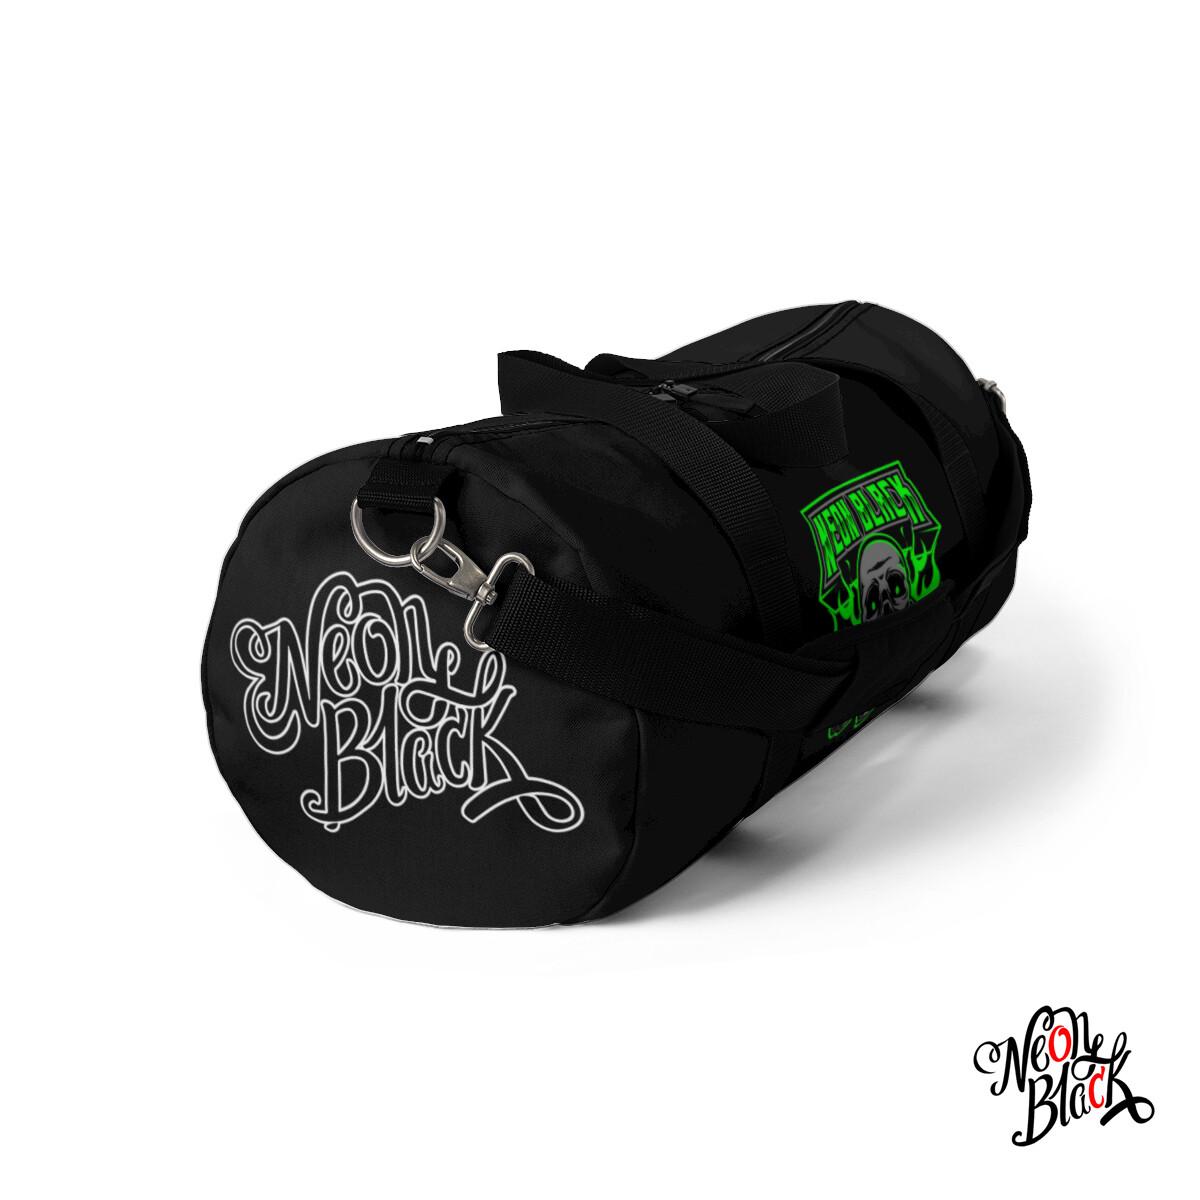 Neon Black Org. Duffle Bag